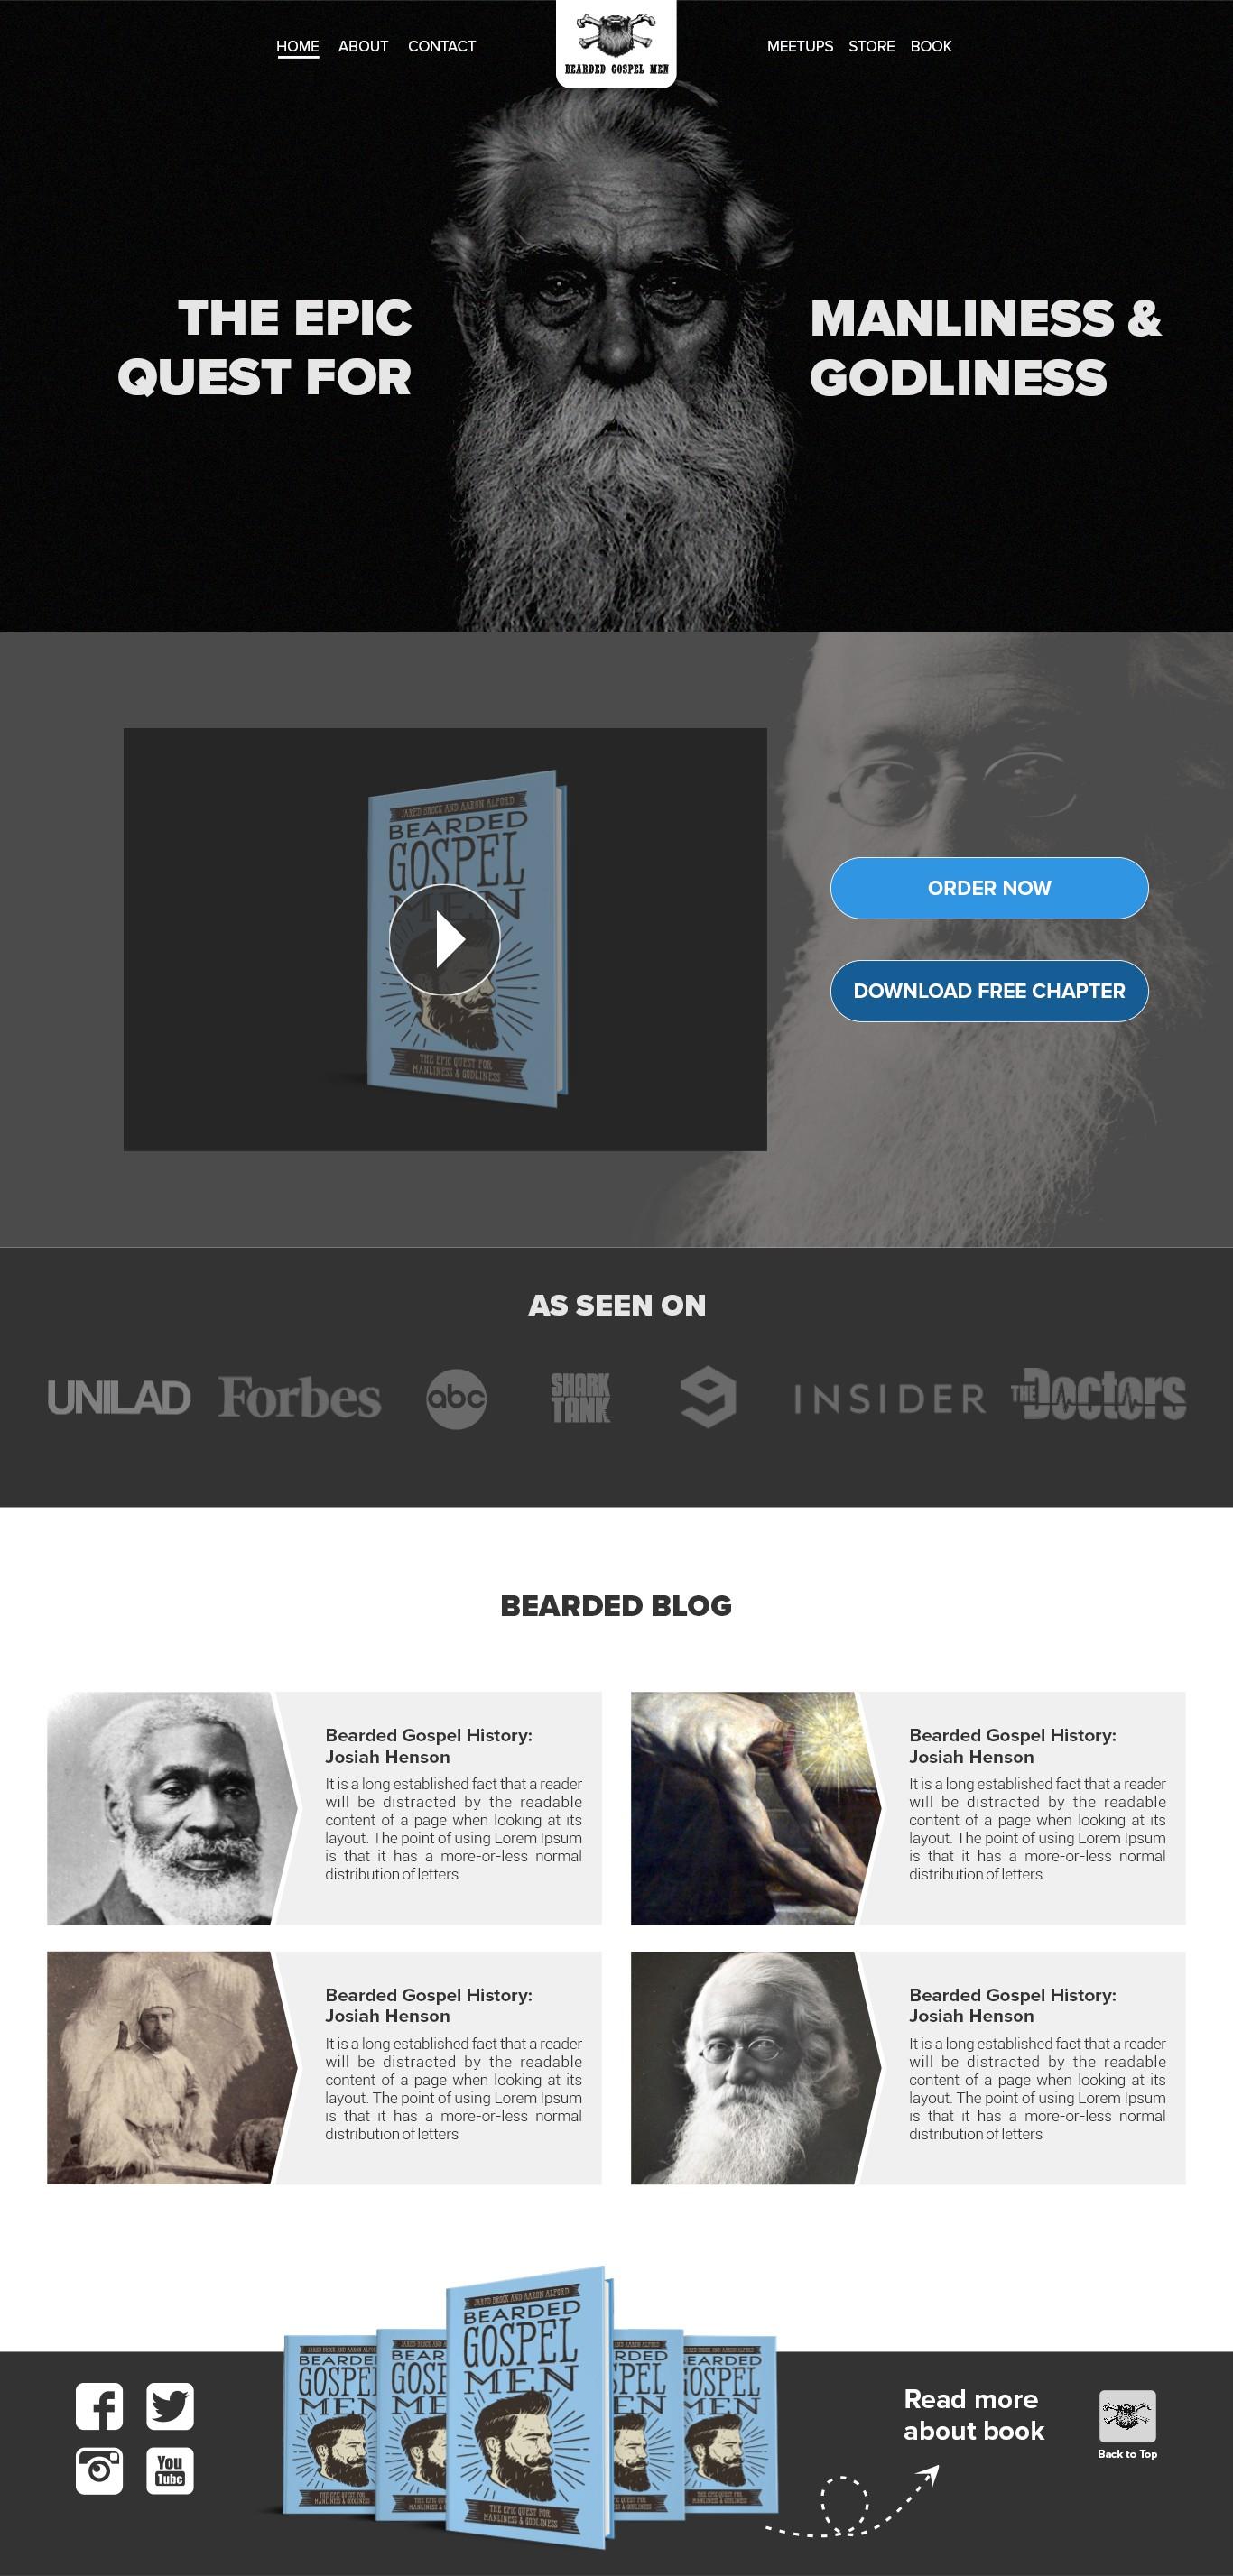 BeardedGospelMen.com Needs a Facelift (But Definitely Not a Shave.)